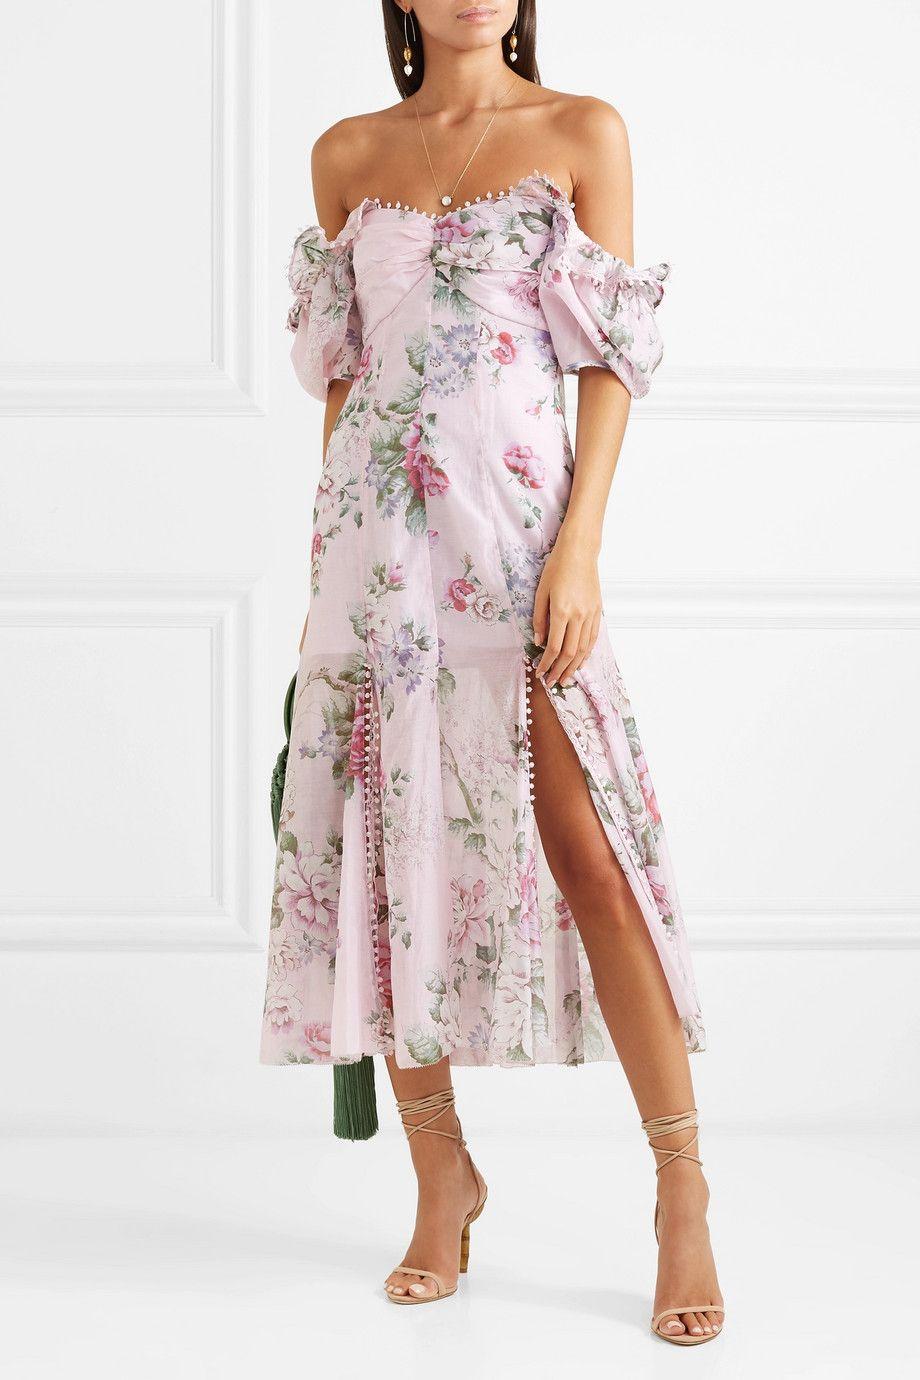 a4c3594303 alice McCALL - Send Me A Postcard floral-print cotton and silk-blend ...